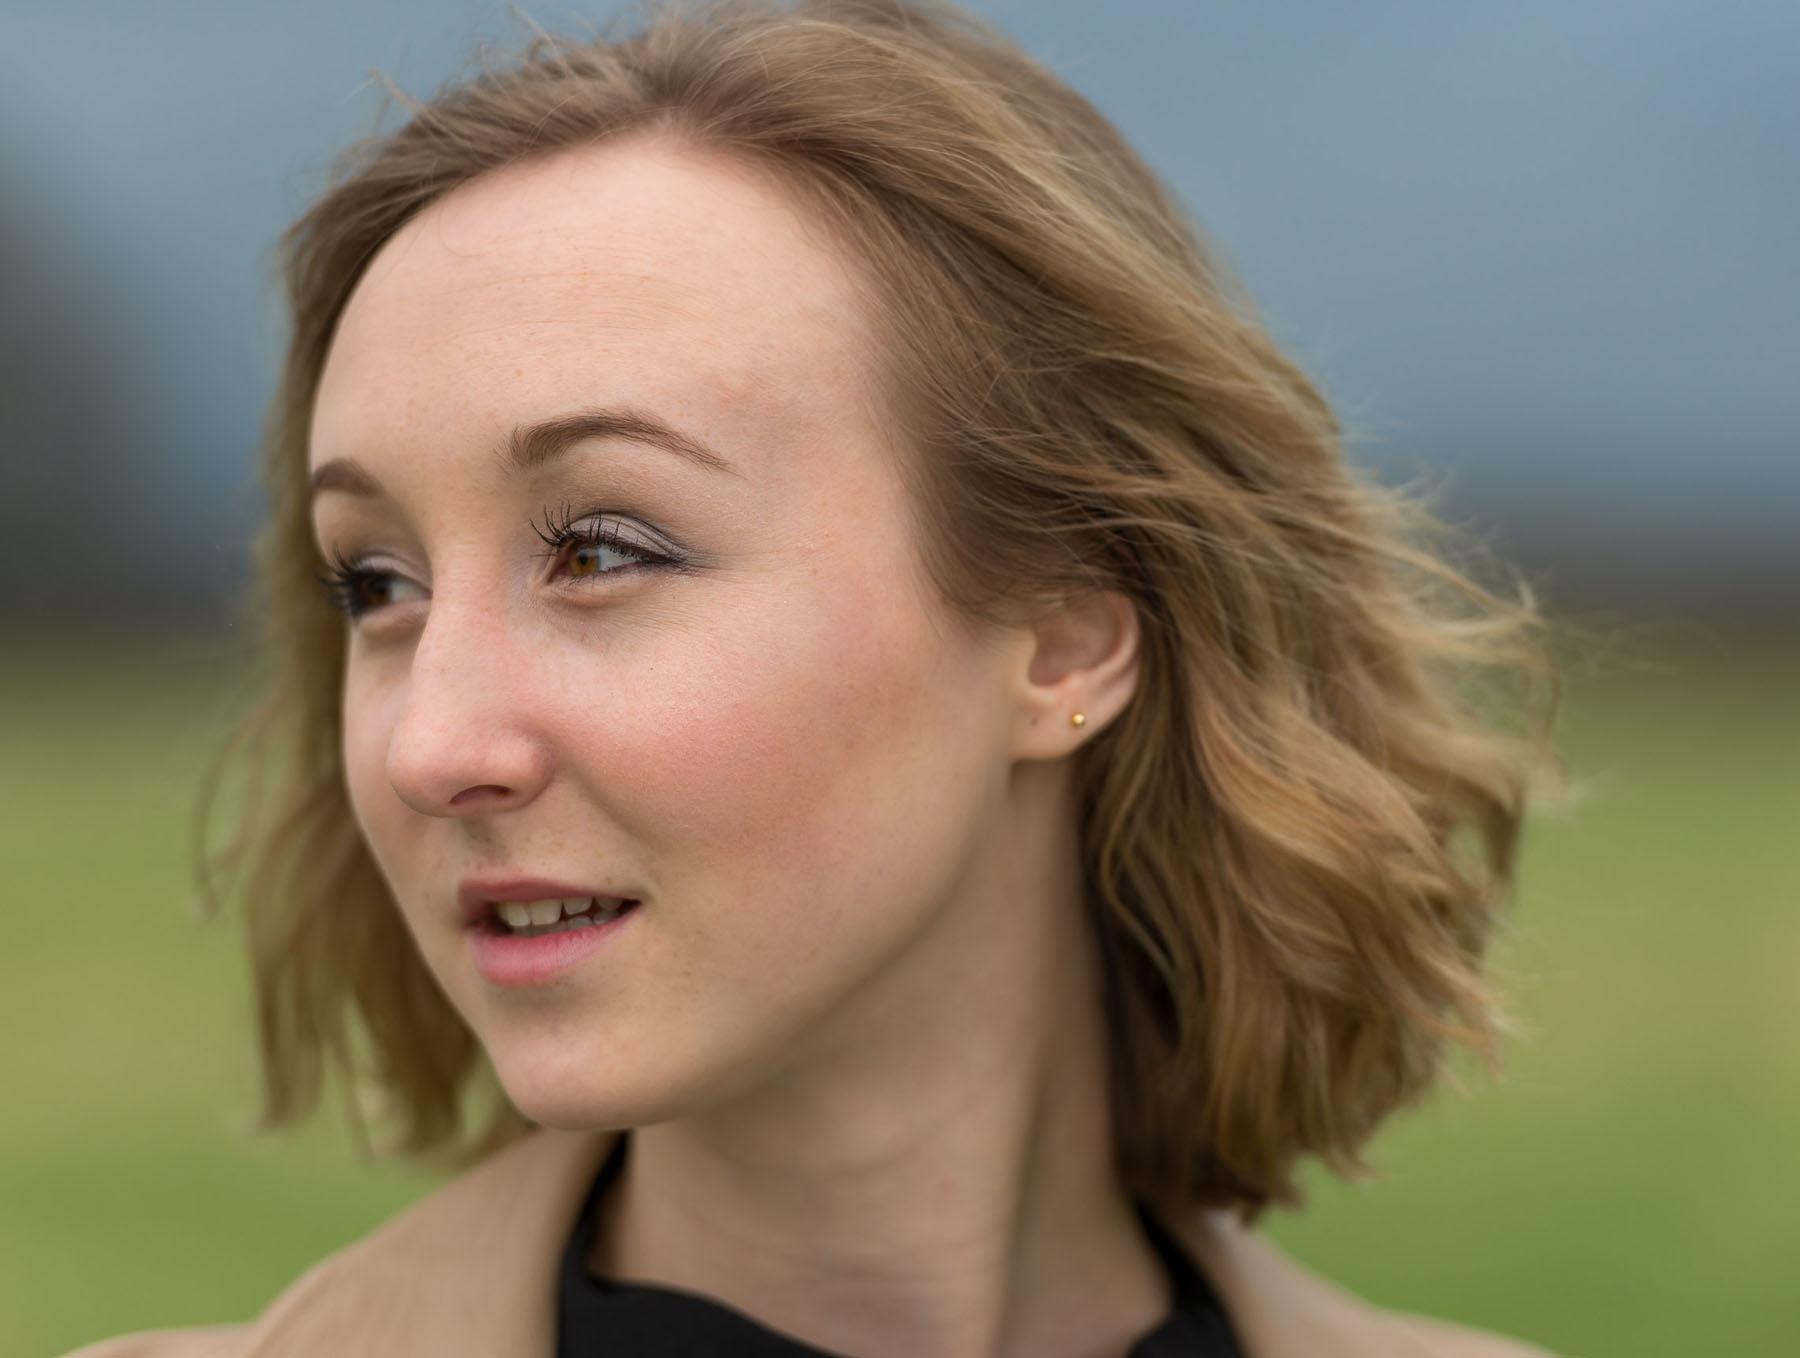 Commercial photographer exeter portrait headshot Devon Somerset